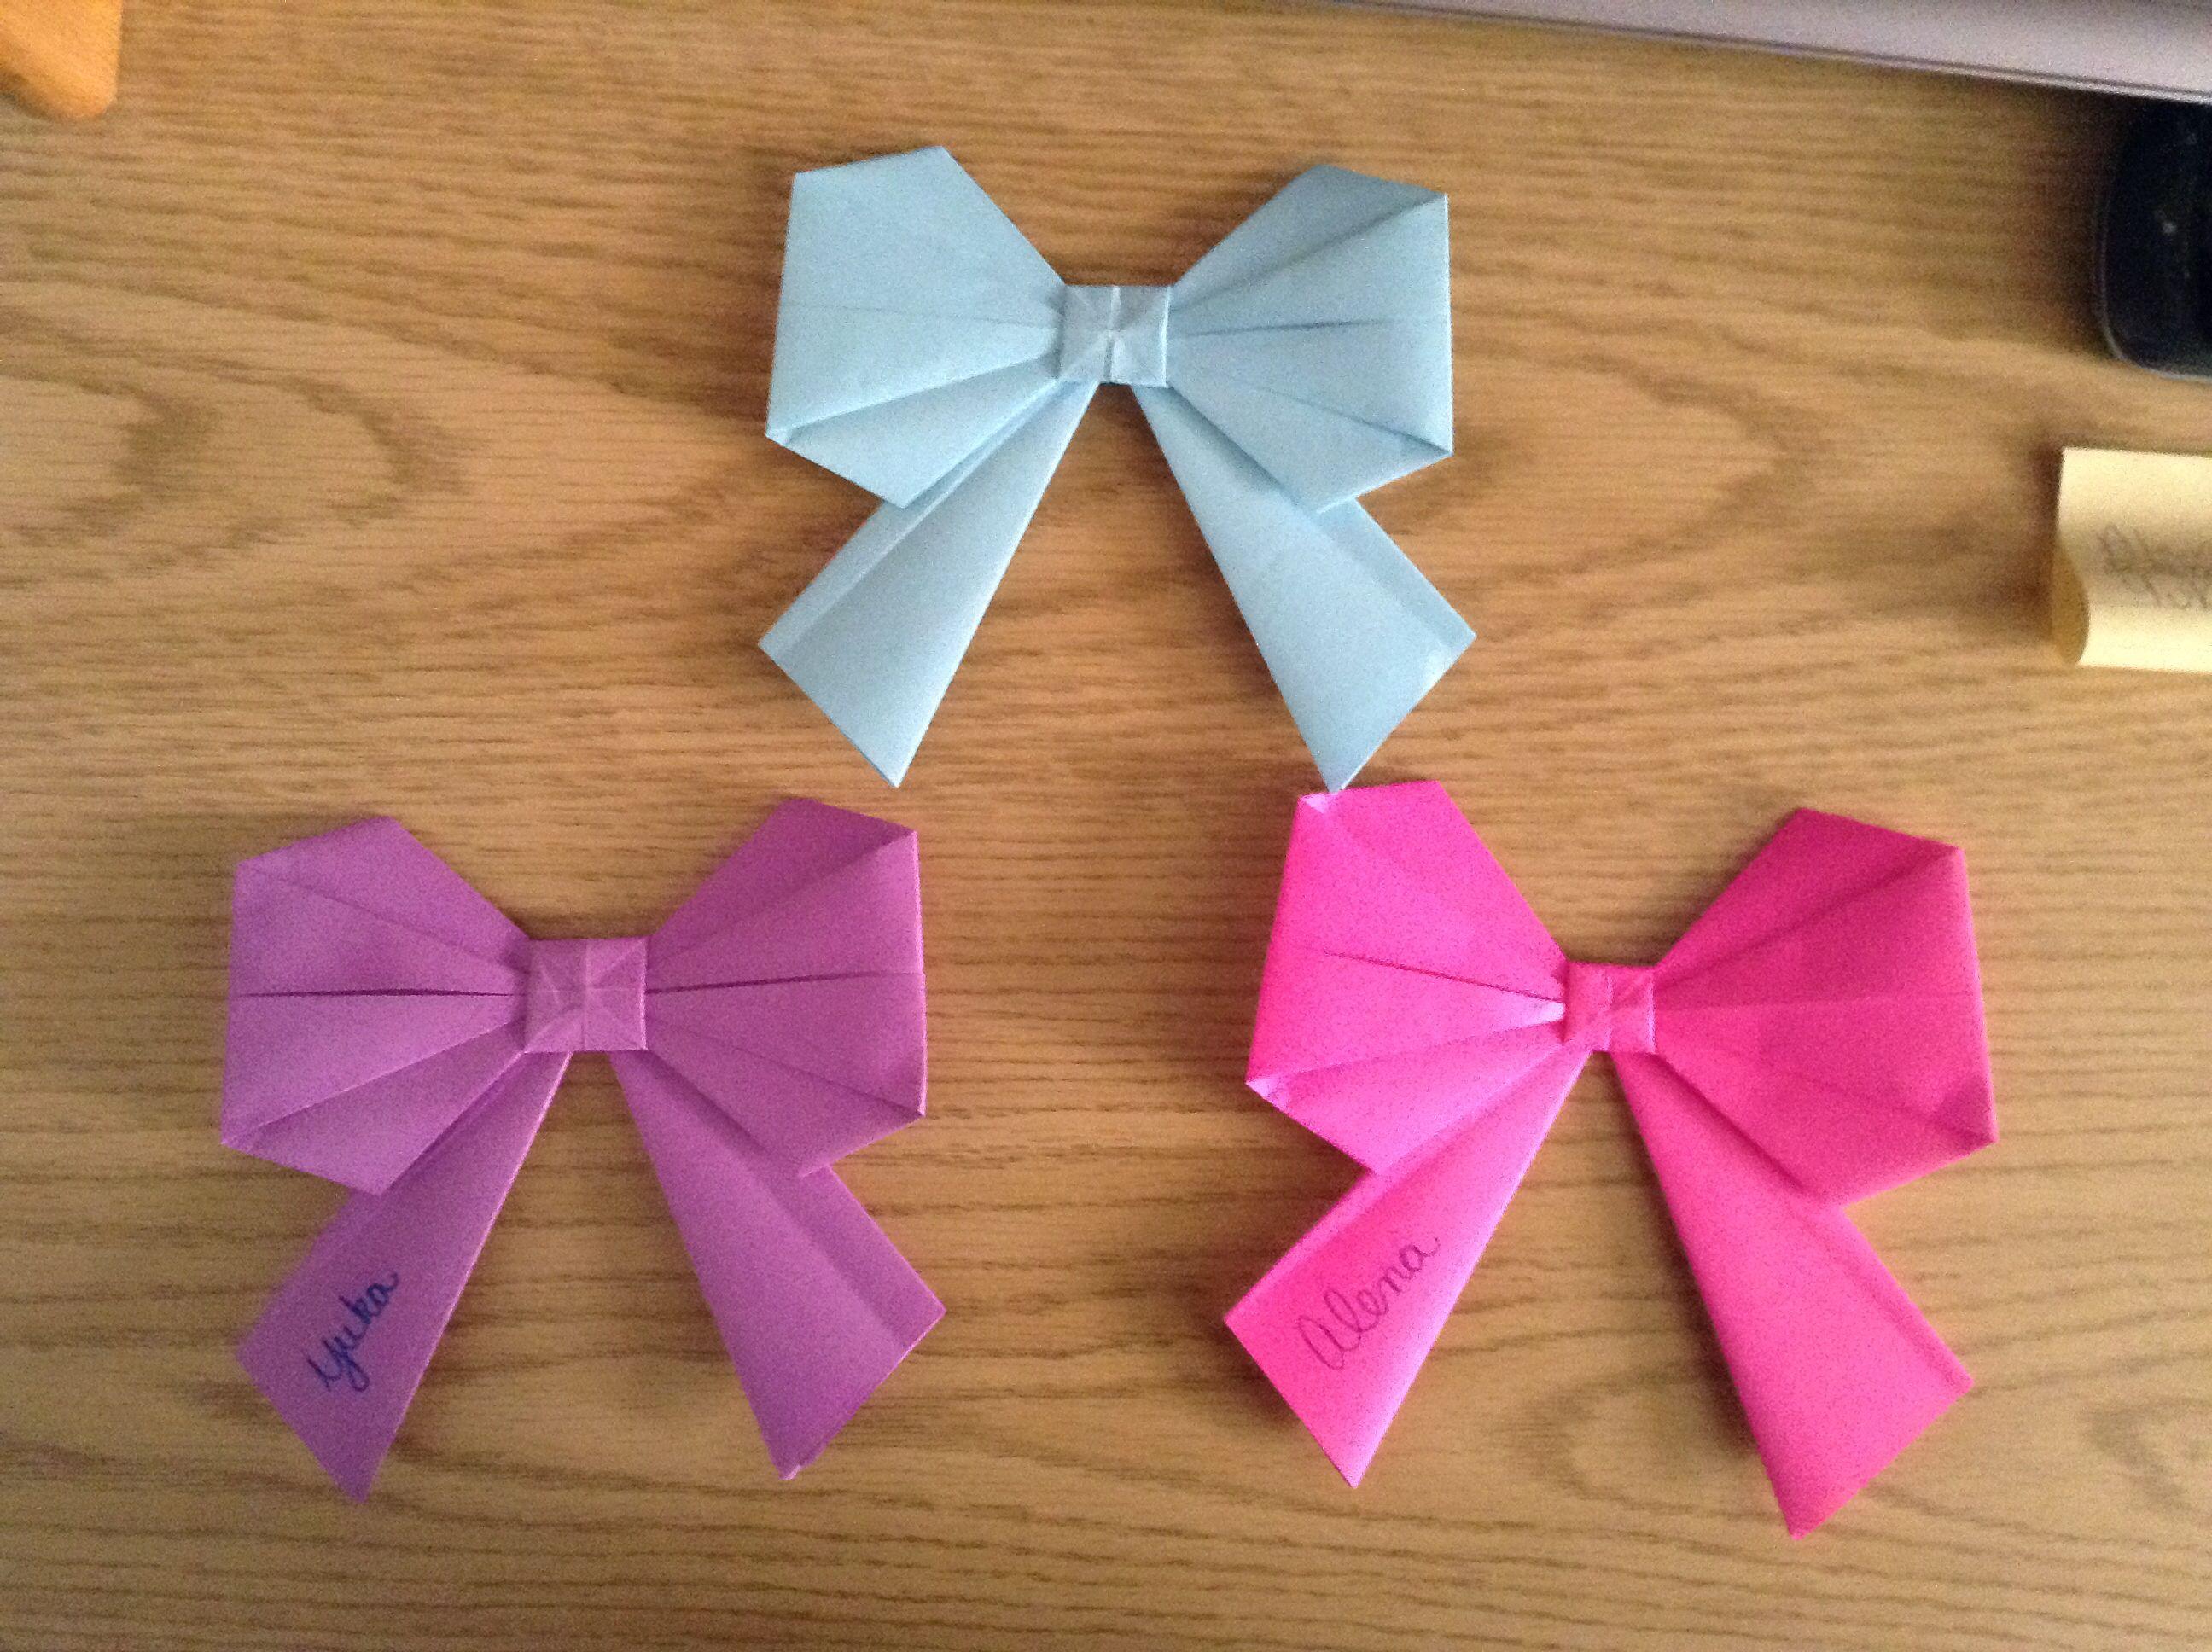 Origami Bow Door Decs #RA | Residence Life | Pinterest ... - photo#40